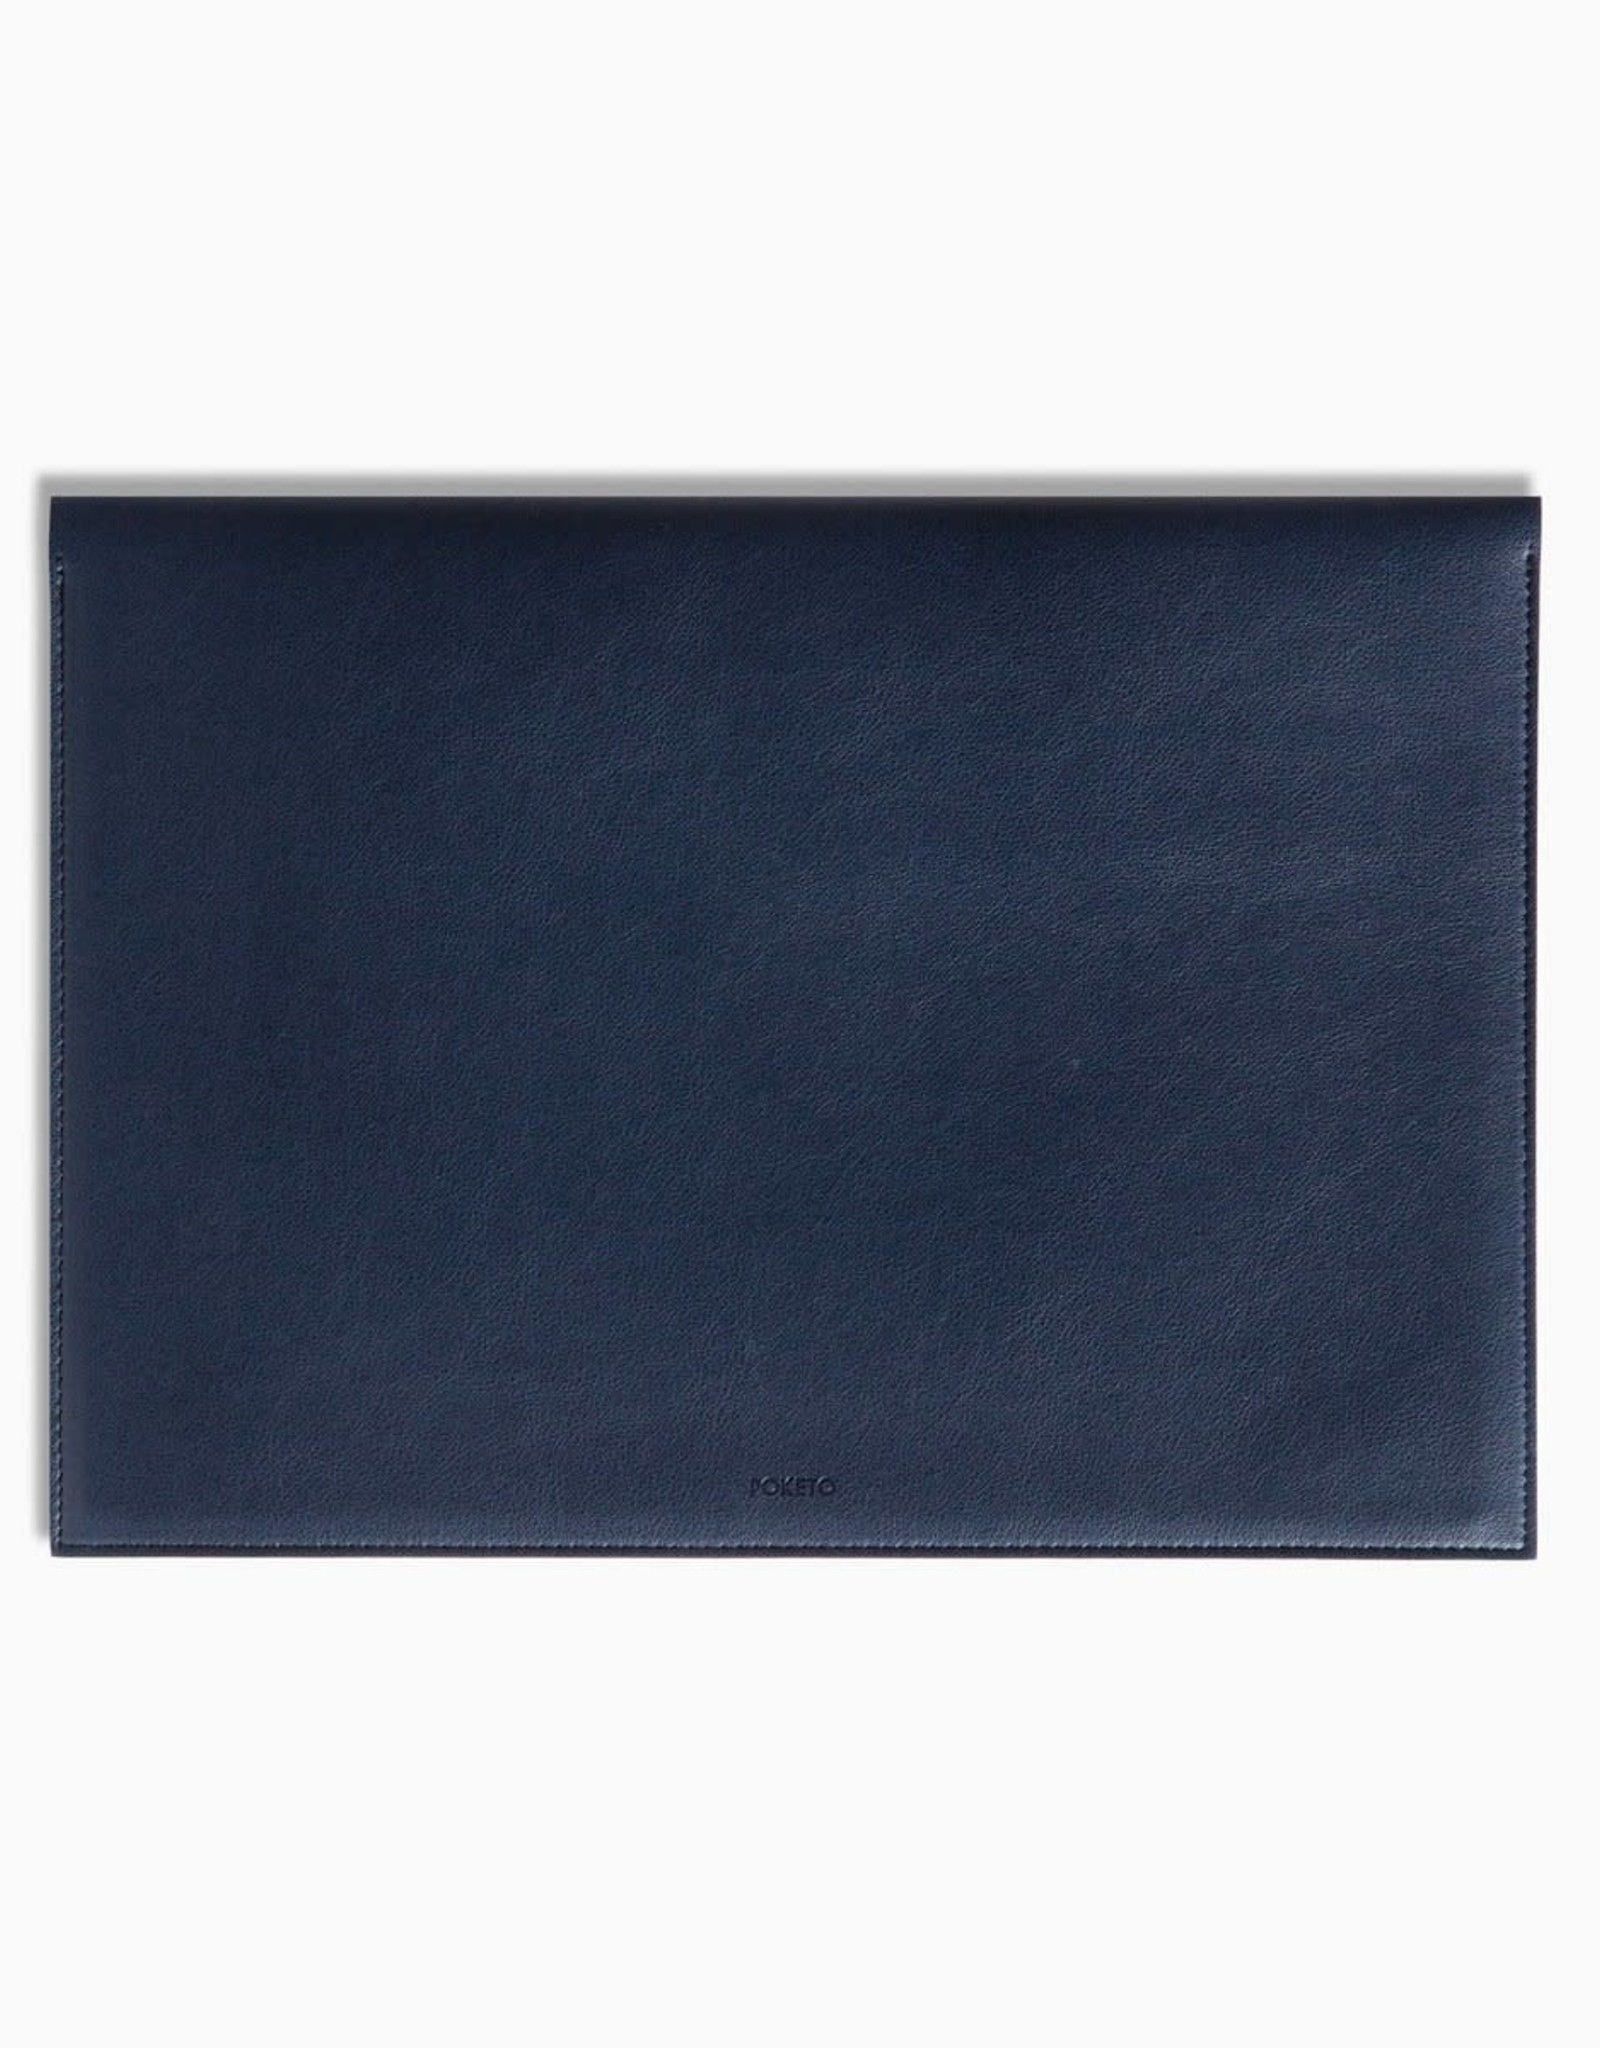 Poketo Poketo Large Minimalist Folio